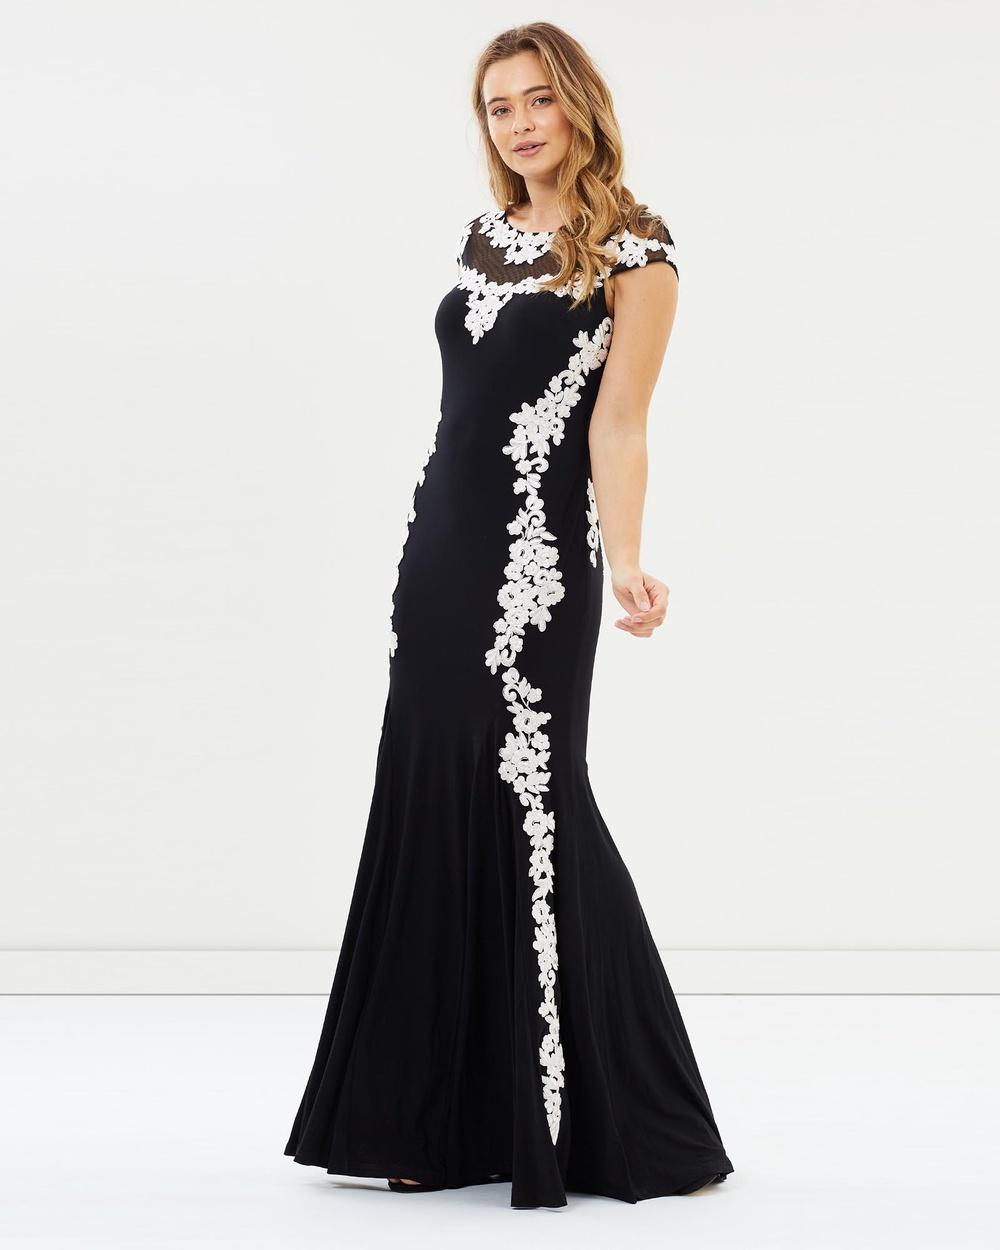 Montique Tiana Lace Jersey Dress Bridesmaid Dresses Black Tiana Lace Jersey Dress